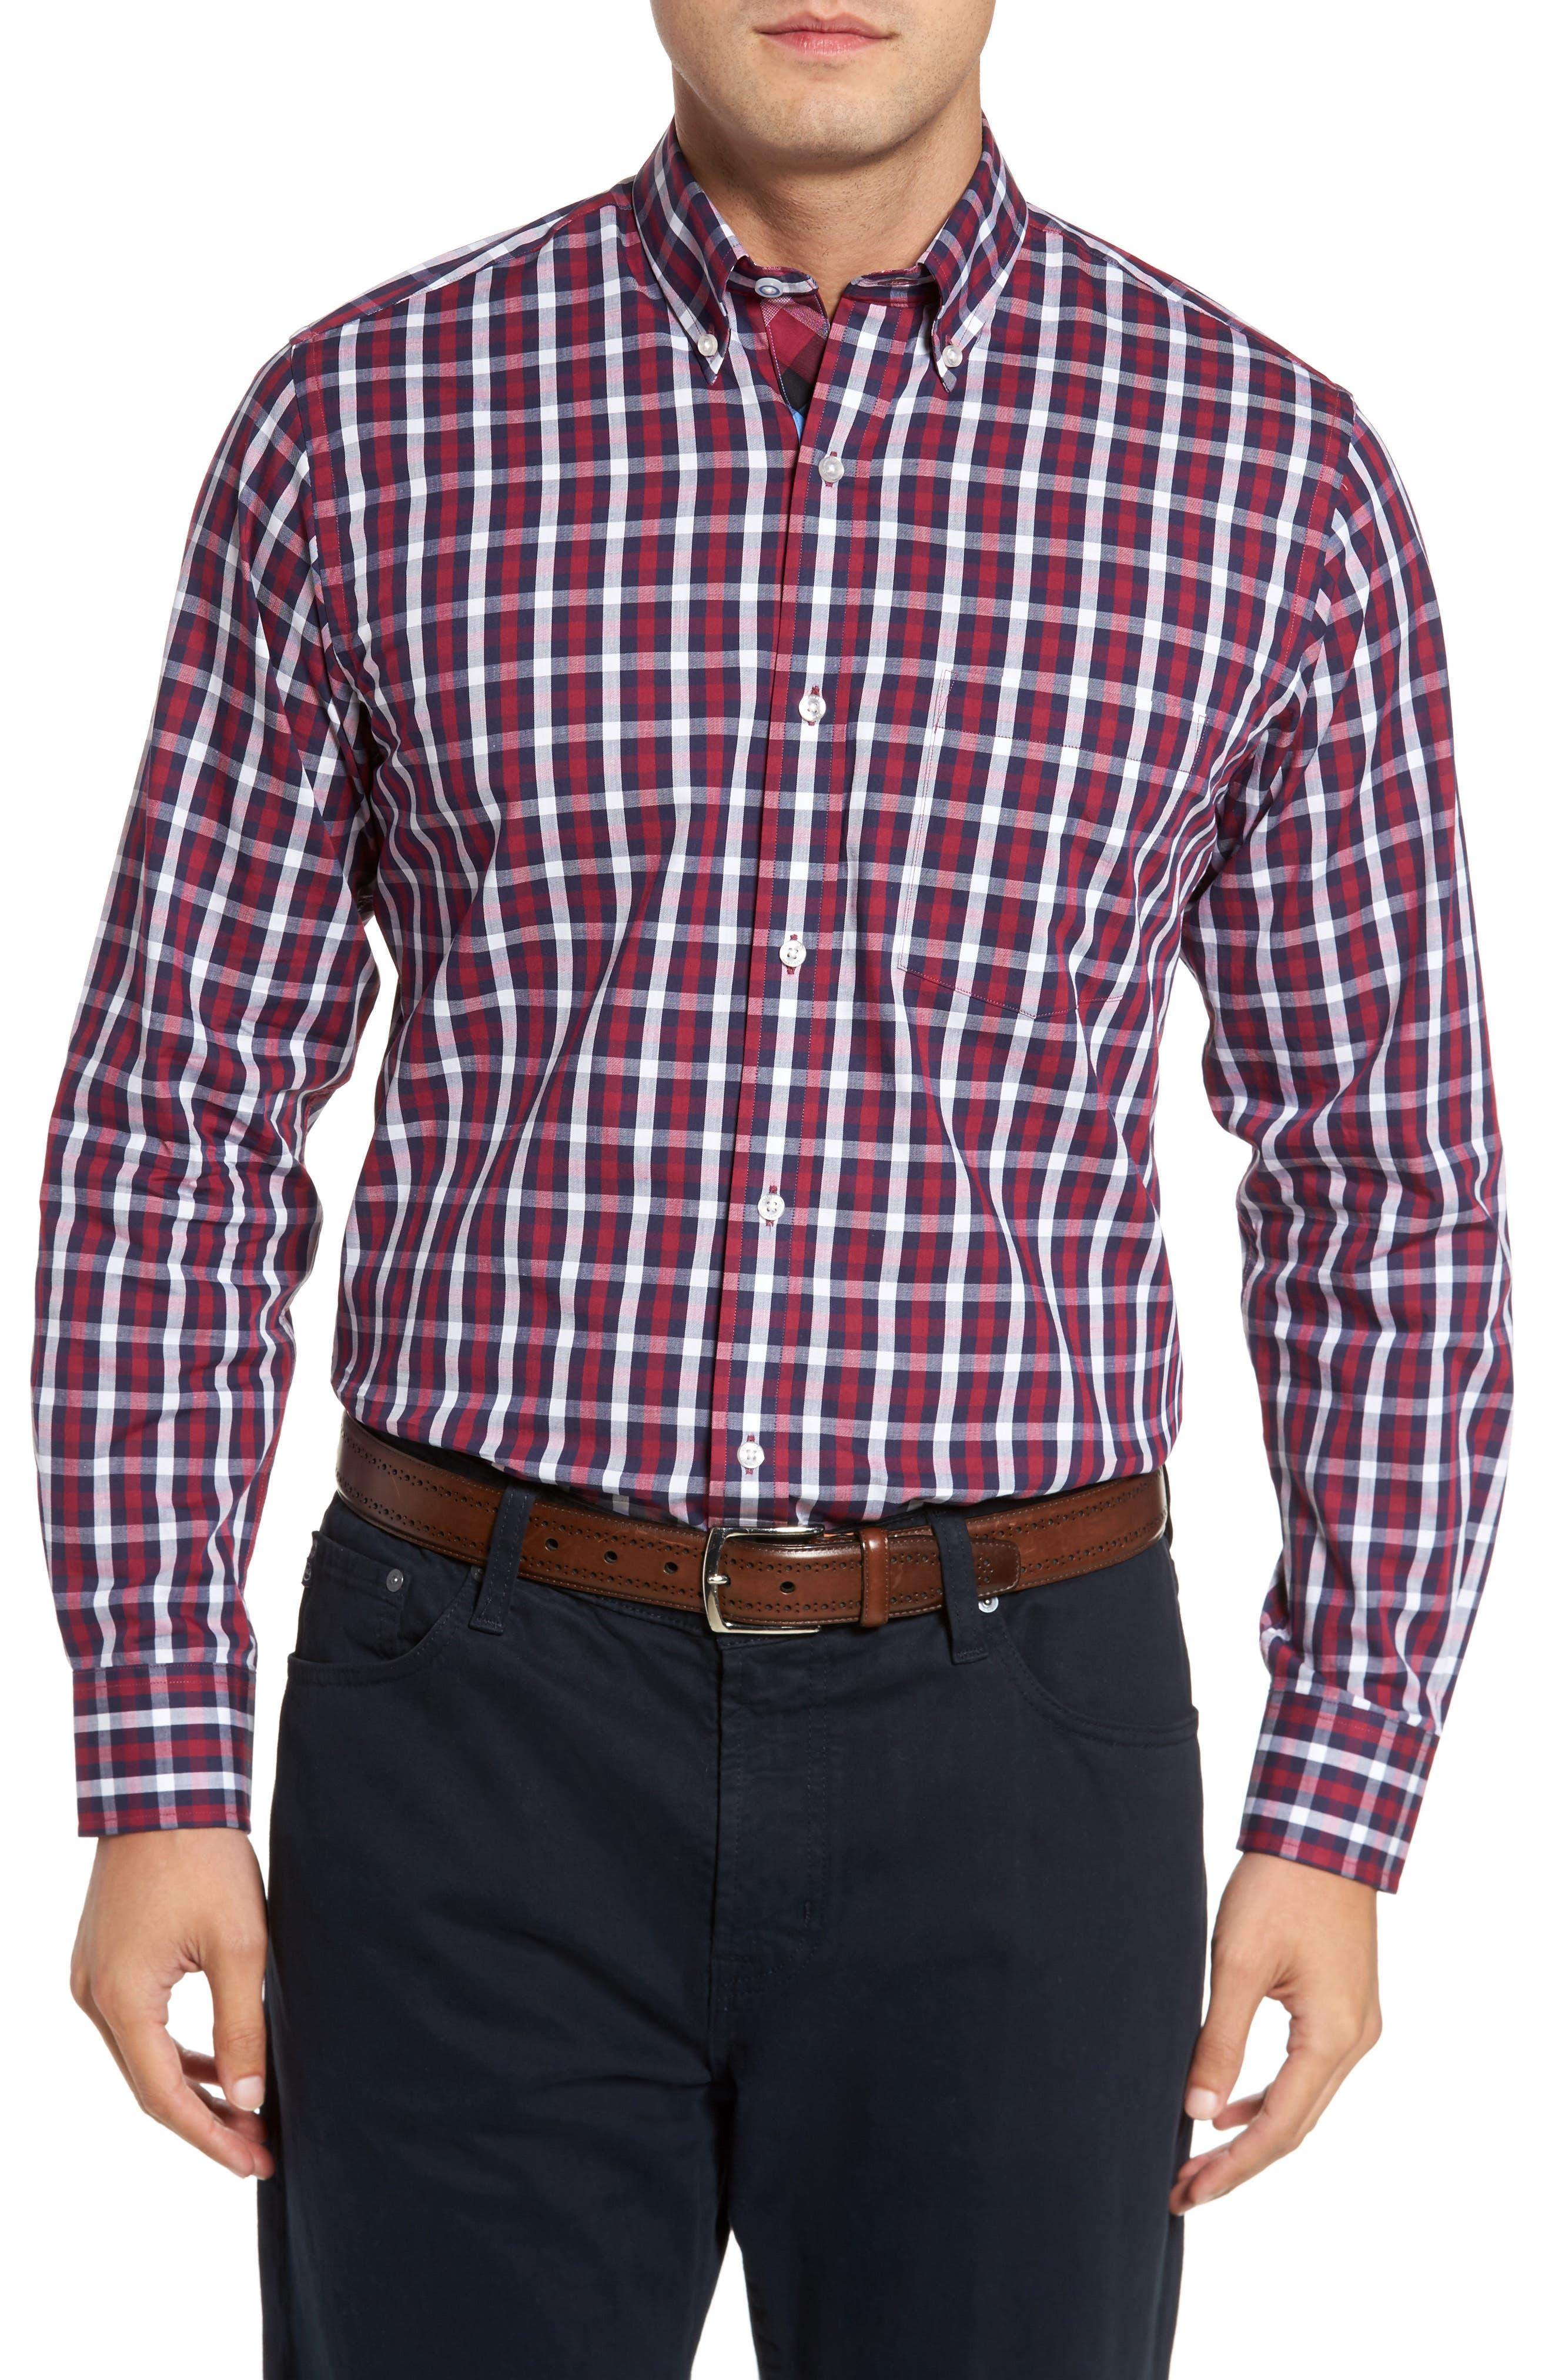 Main Image - TailorByrd Covington Check Sport Shirt